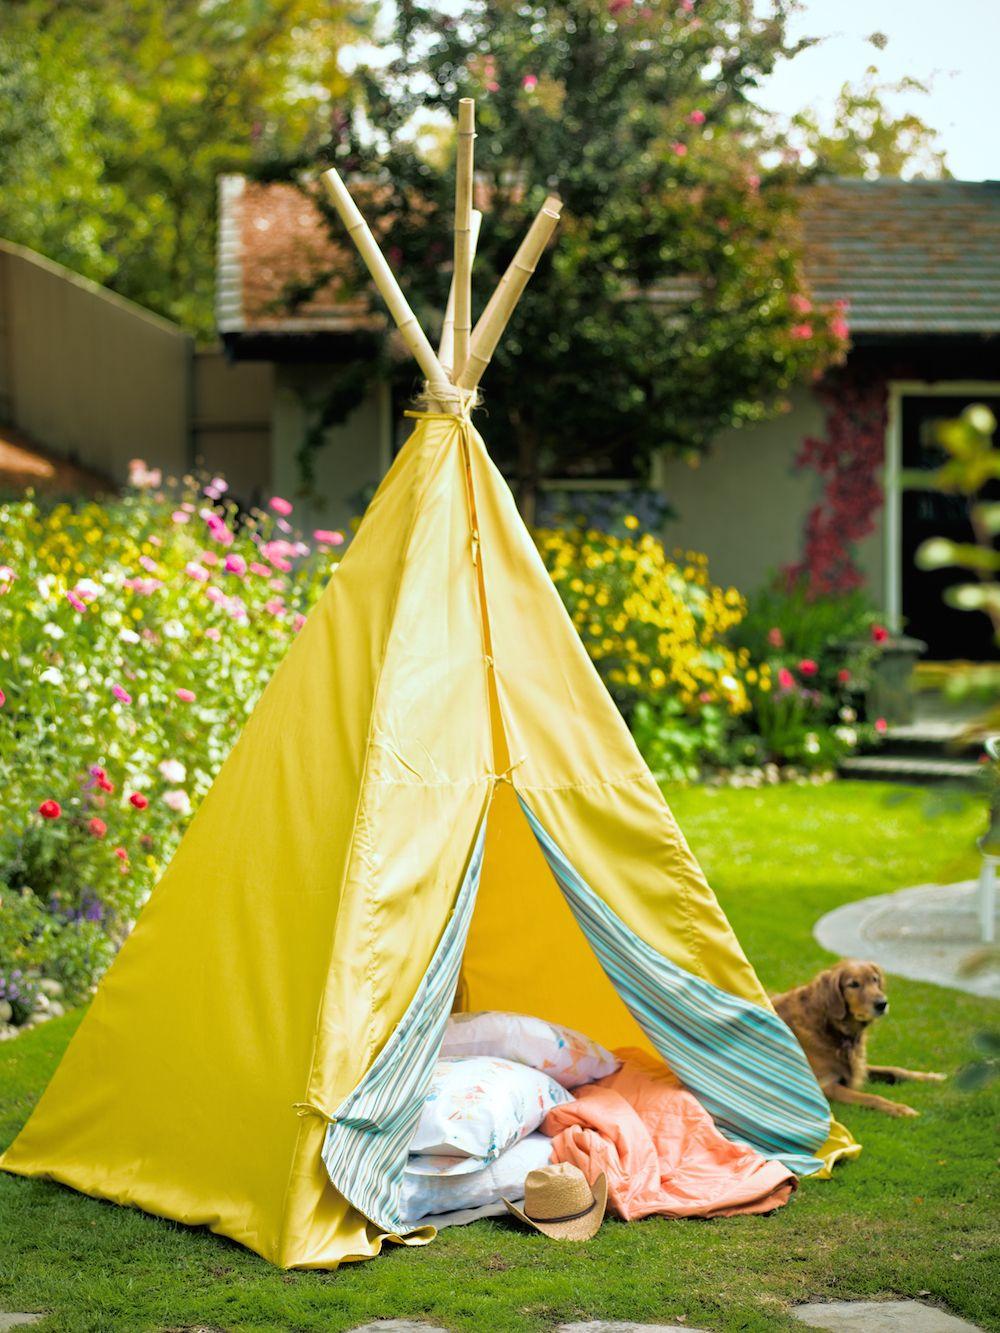 How to Make a Backyard Tipi | Outdoor, Backyard getaway ...